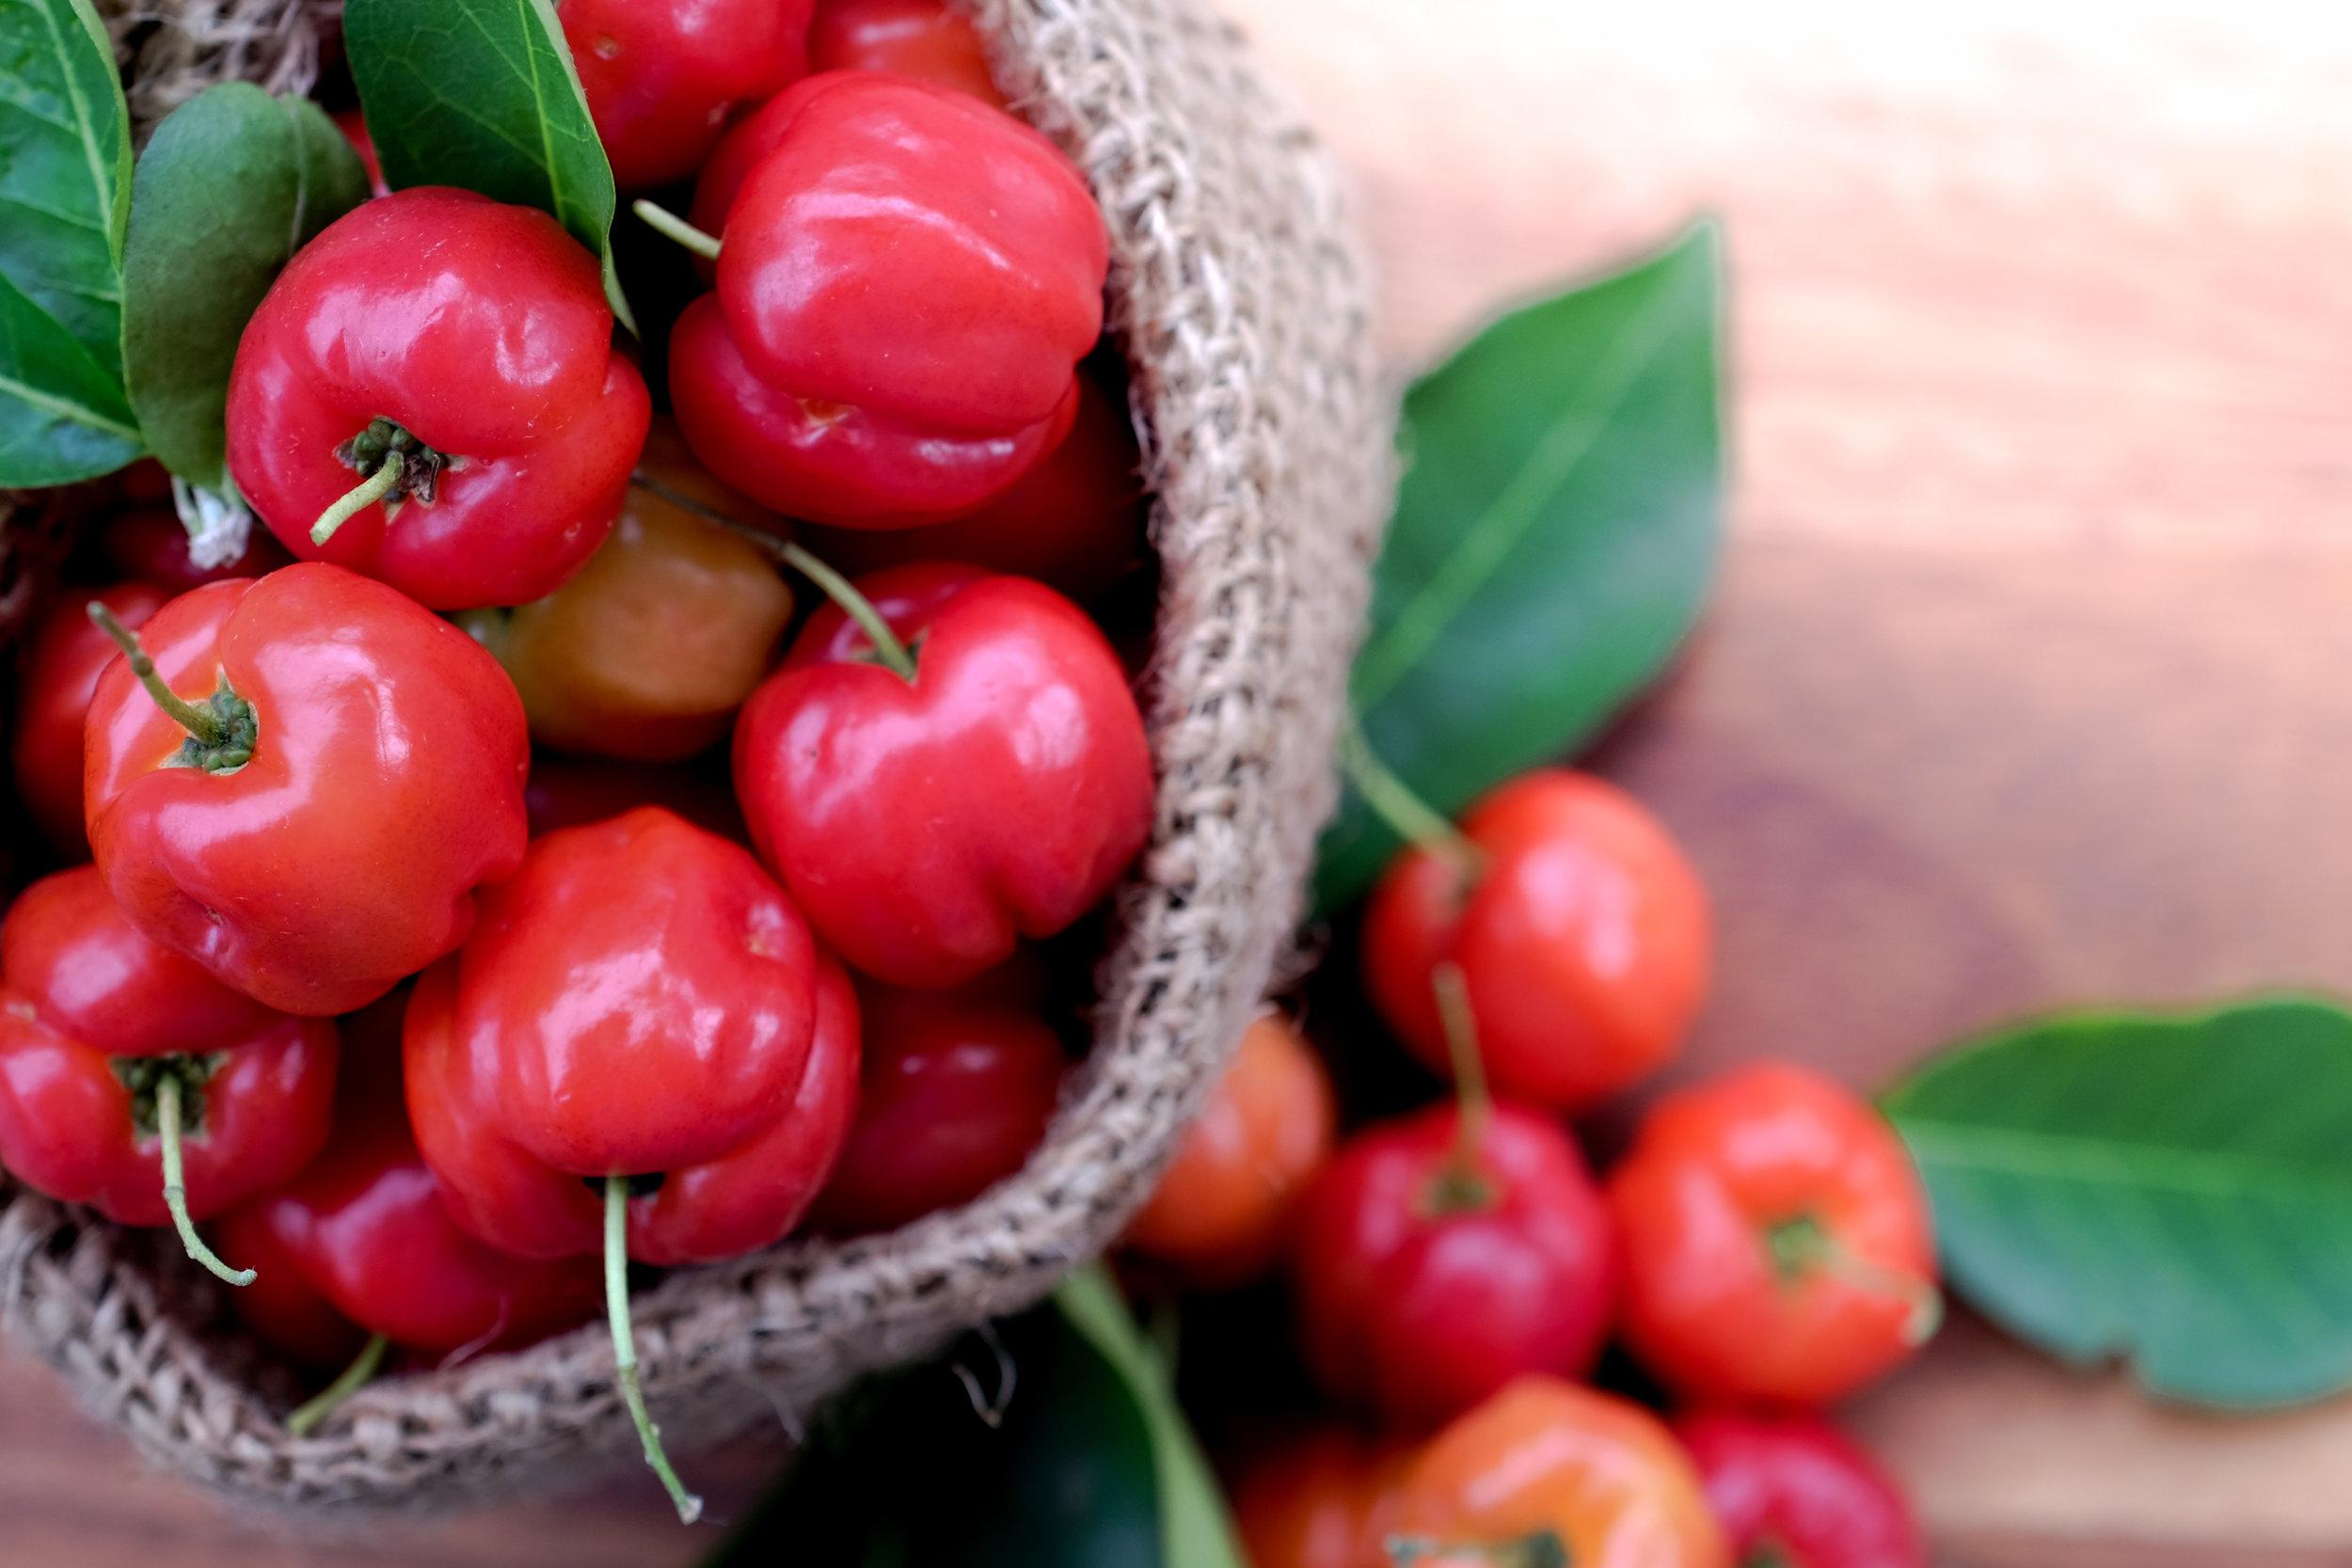 Fruit + Berry Extracts - Apple fiber, Apple Pectin, Acerola fruit, Papaya fruit, Bilberry fruit